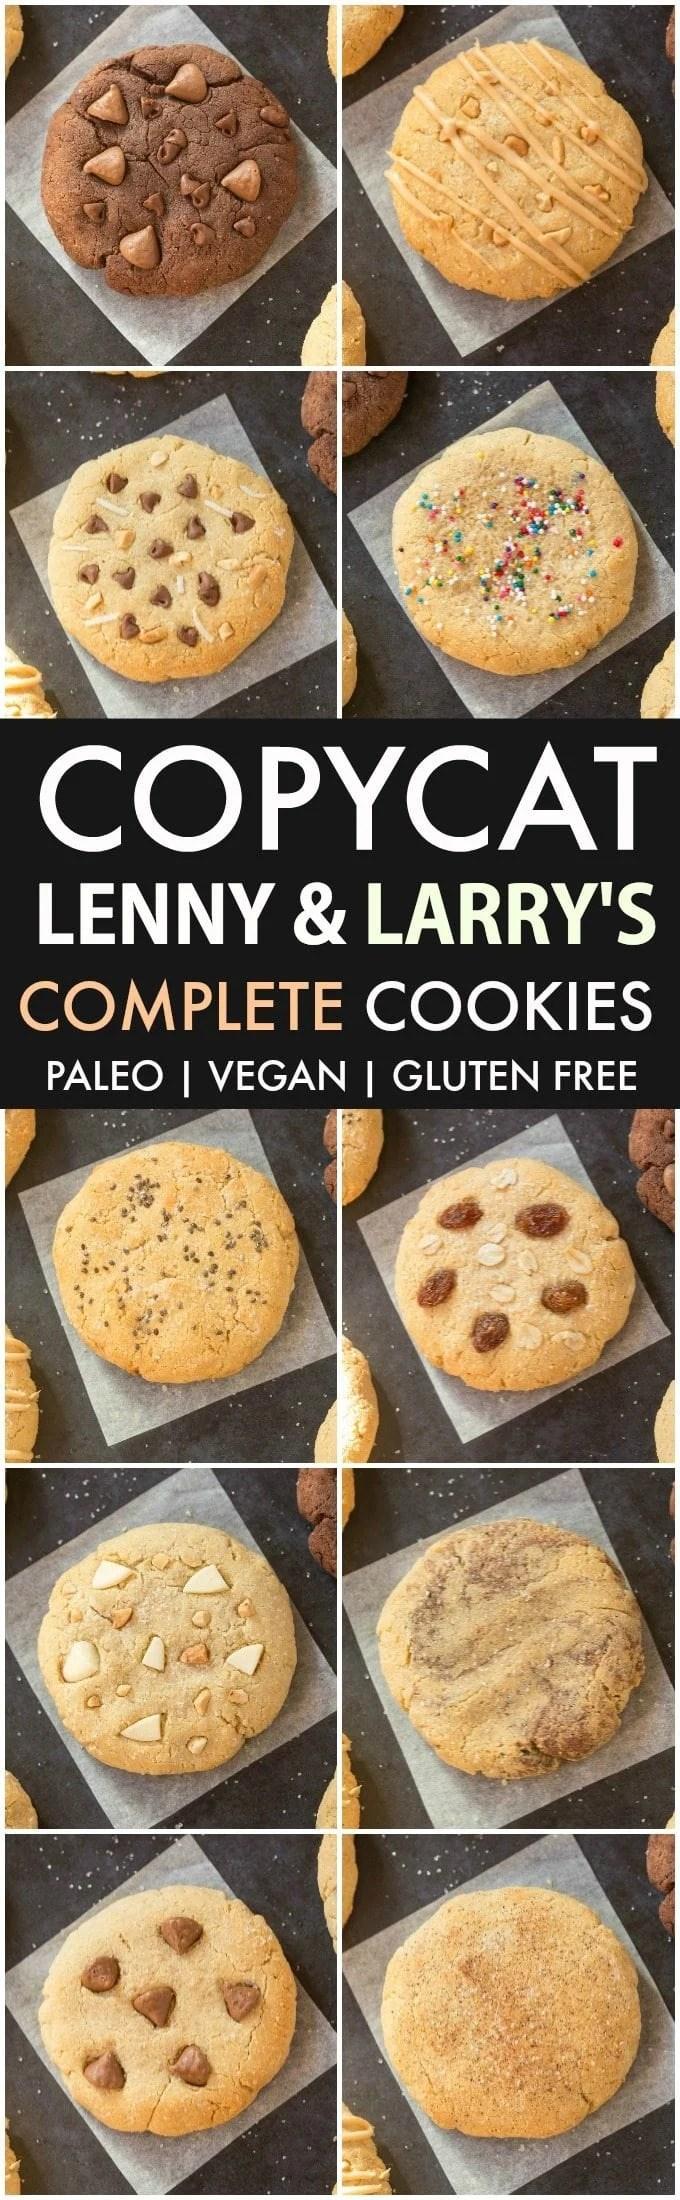 Diet Center Cookbook Peotein Cake Recipes